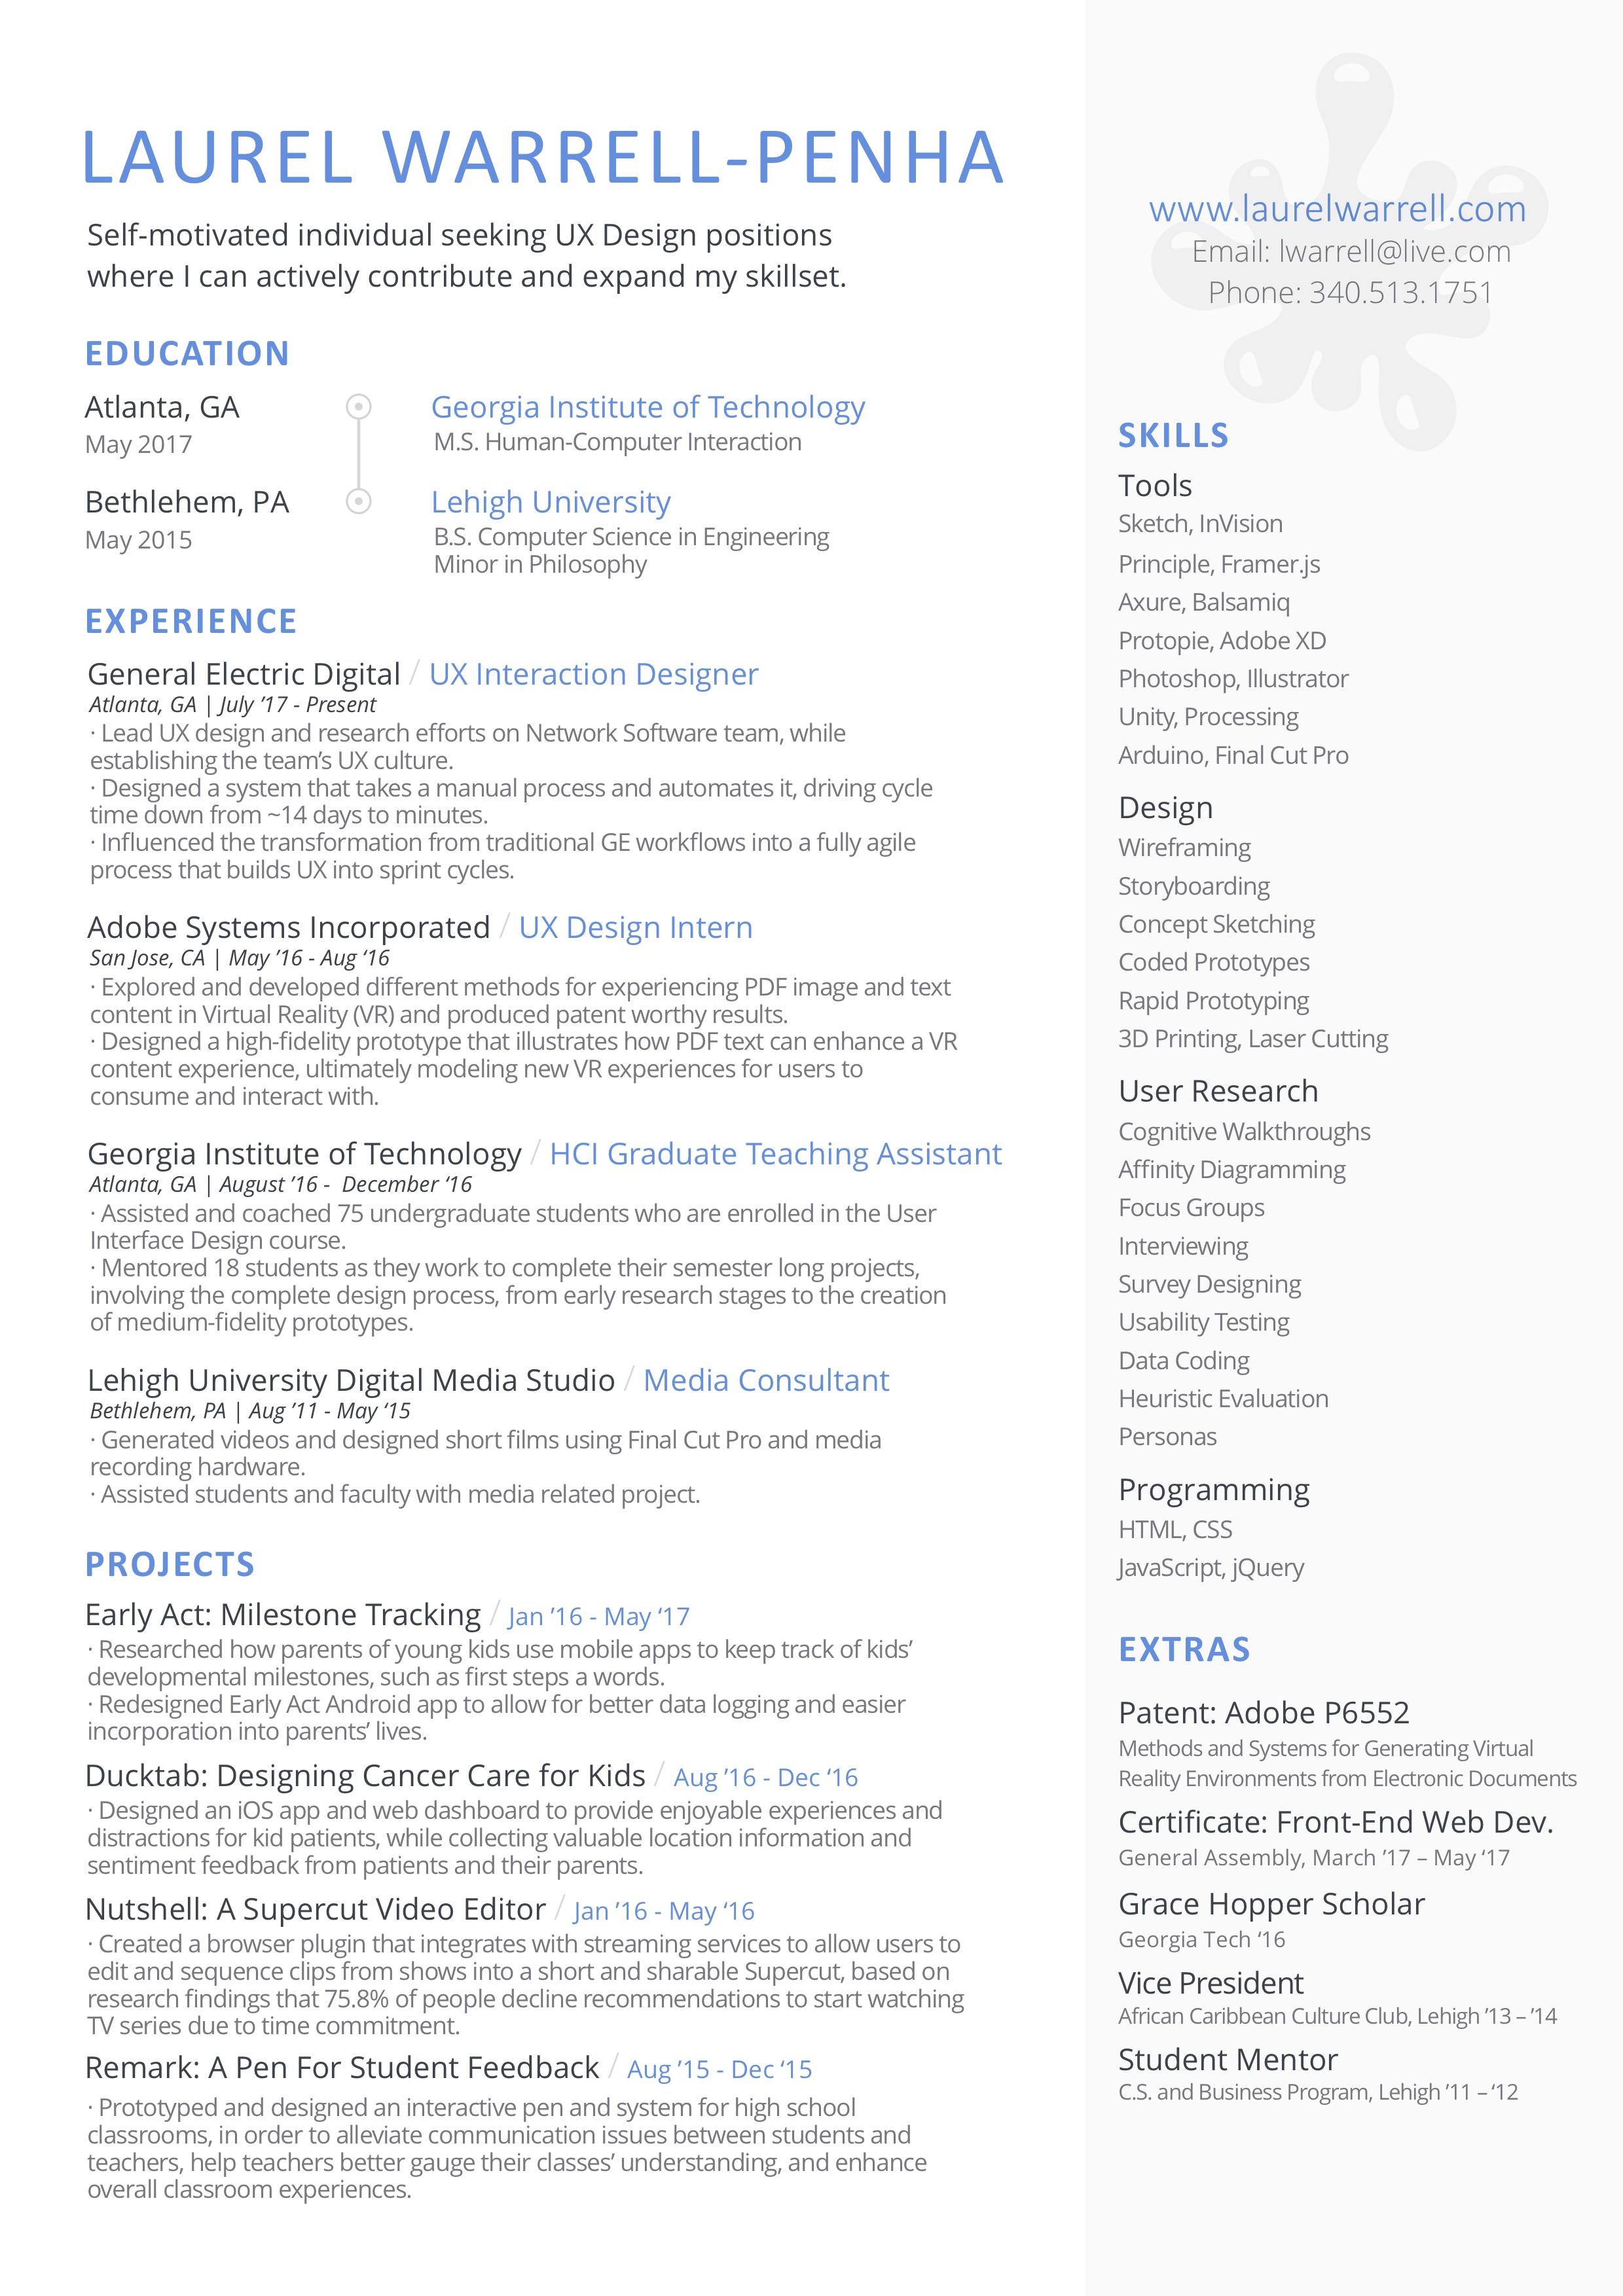 WarrellPenha_Resume.png